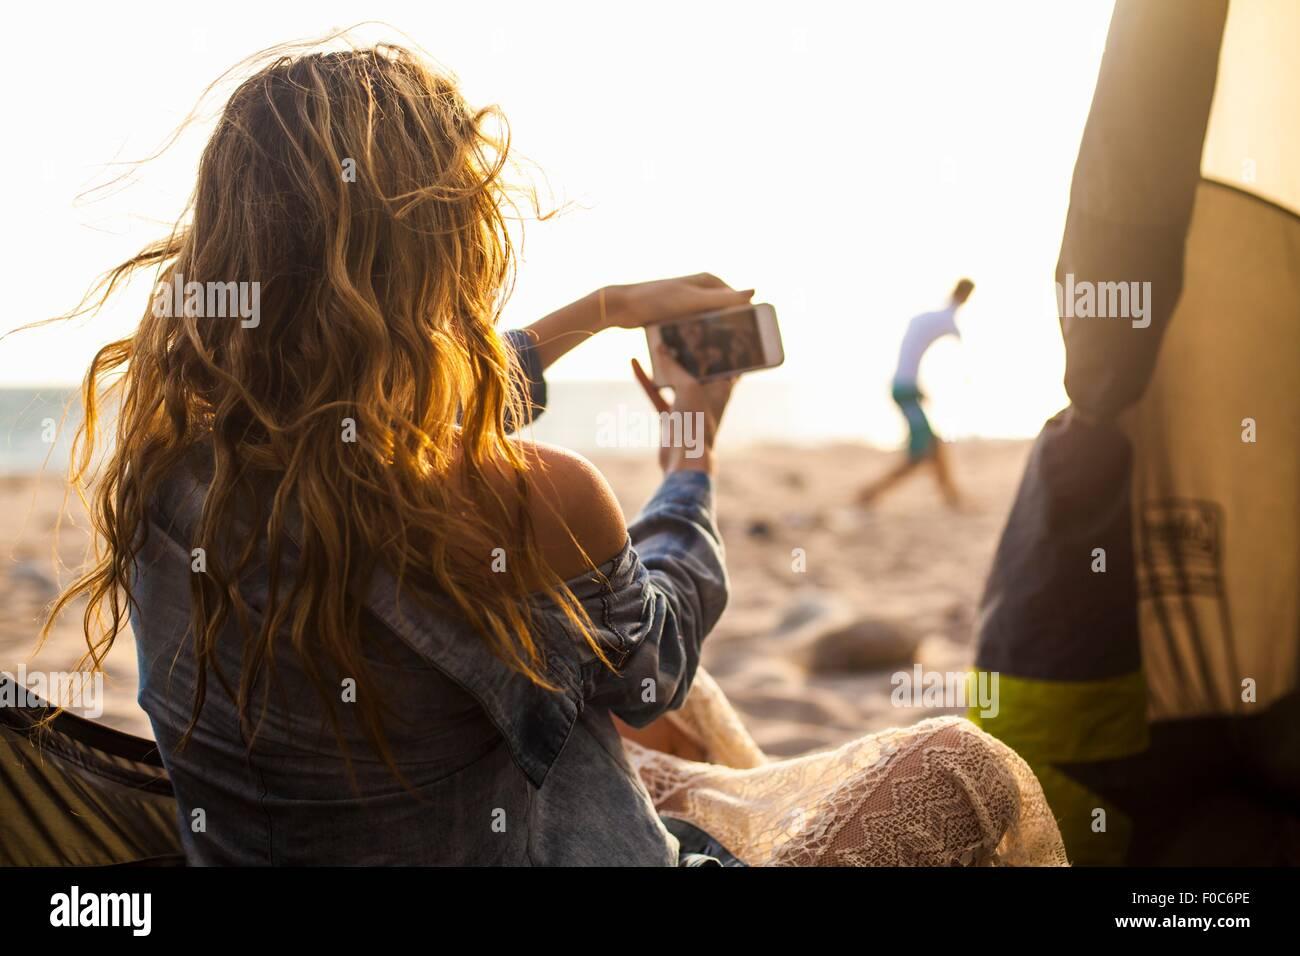 Woman taking photograph on beach - Stock Image